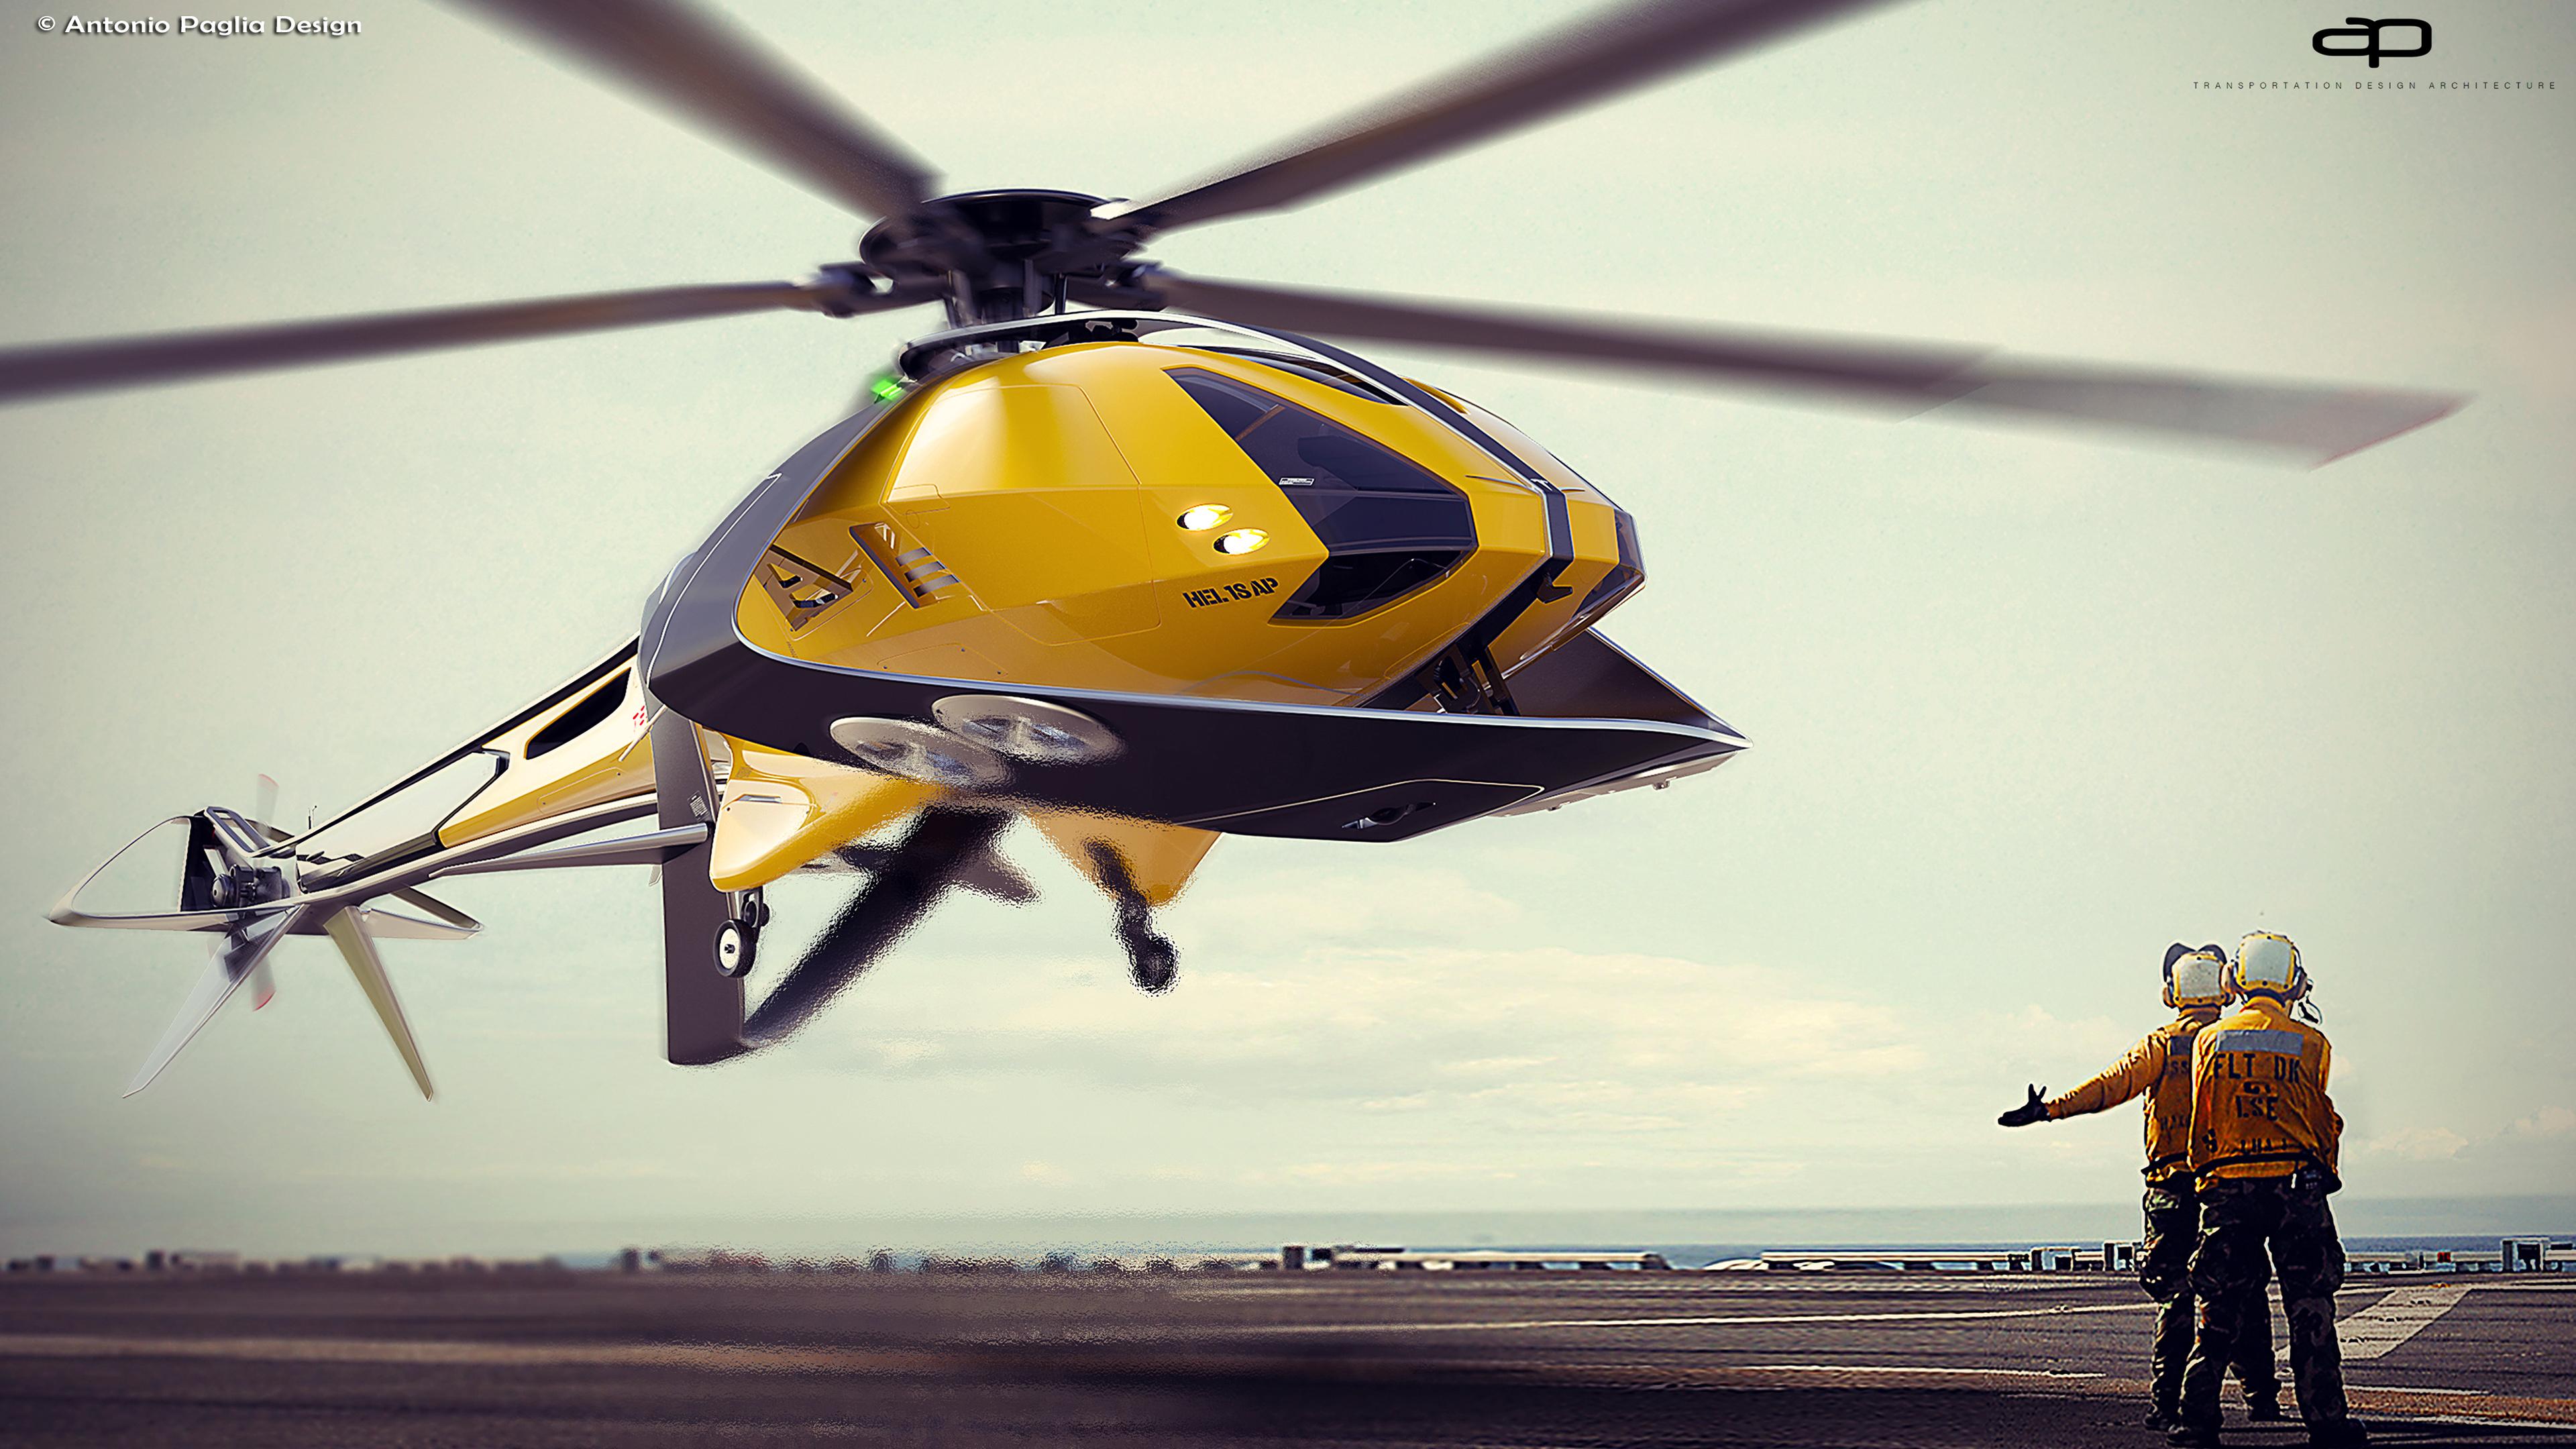 Elicottero 3d Model : Kit originale elicottero d ch d alzrc devil fast flybarless